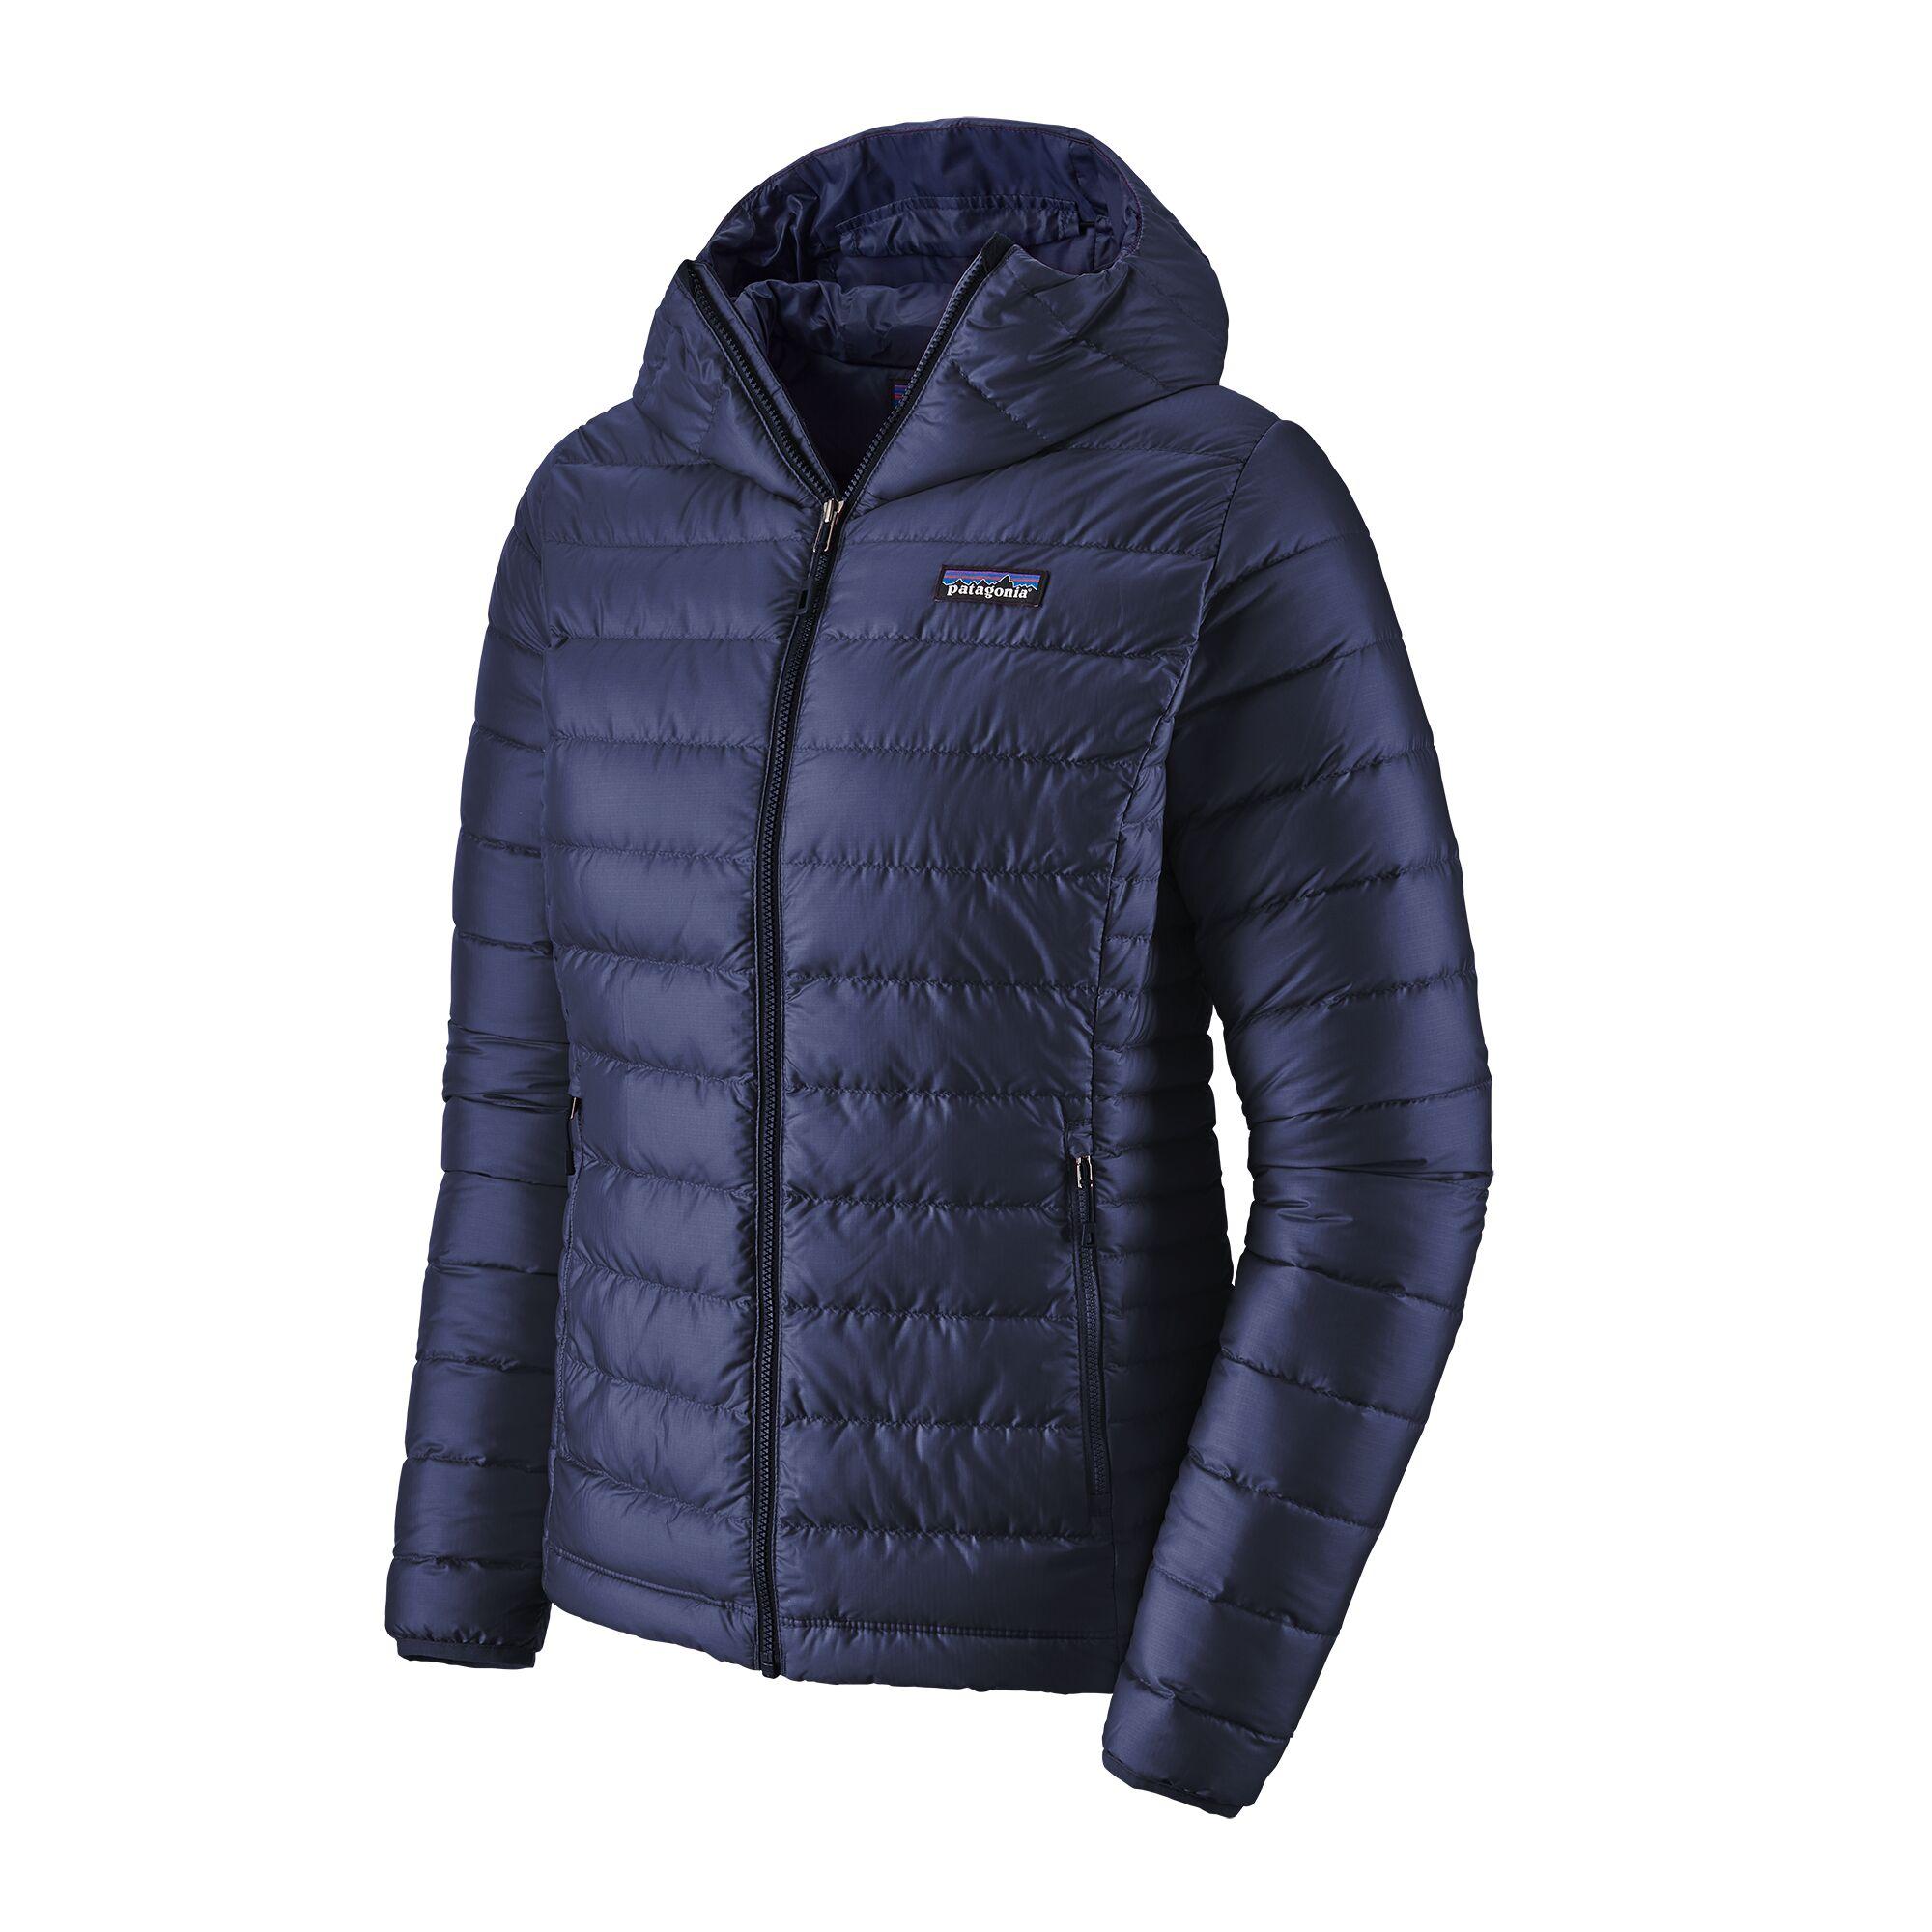 Patagonia Down Sweater Hoody - Daunenjacke - Damen